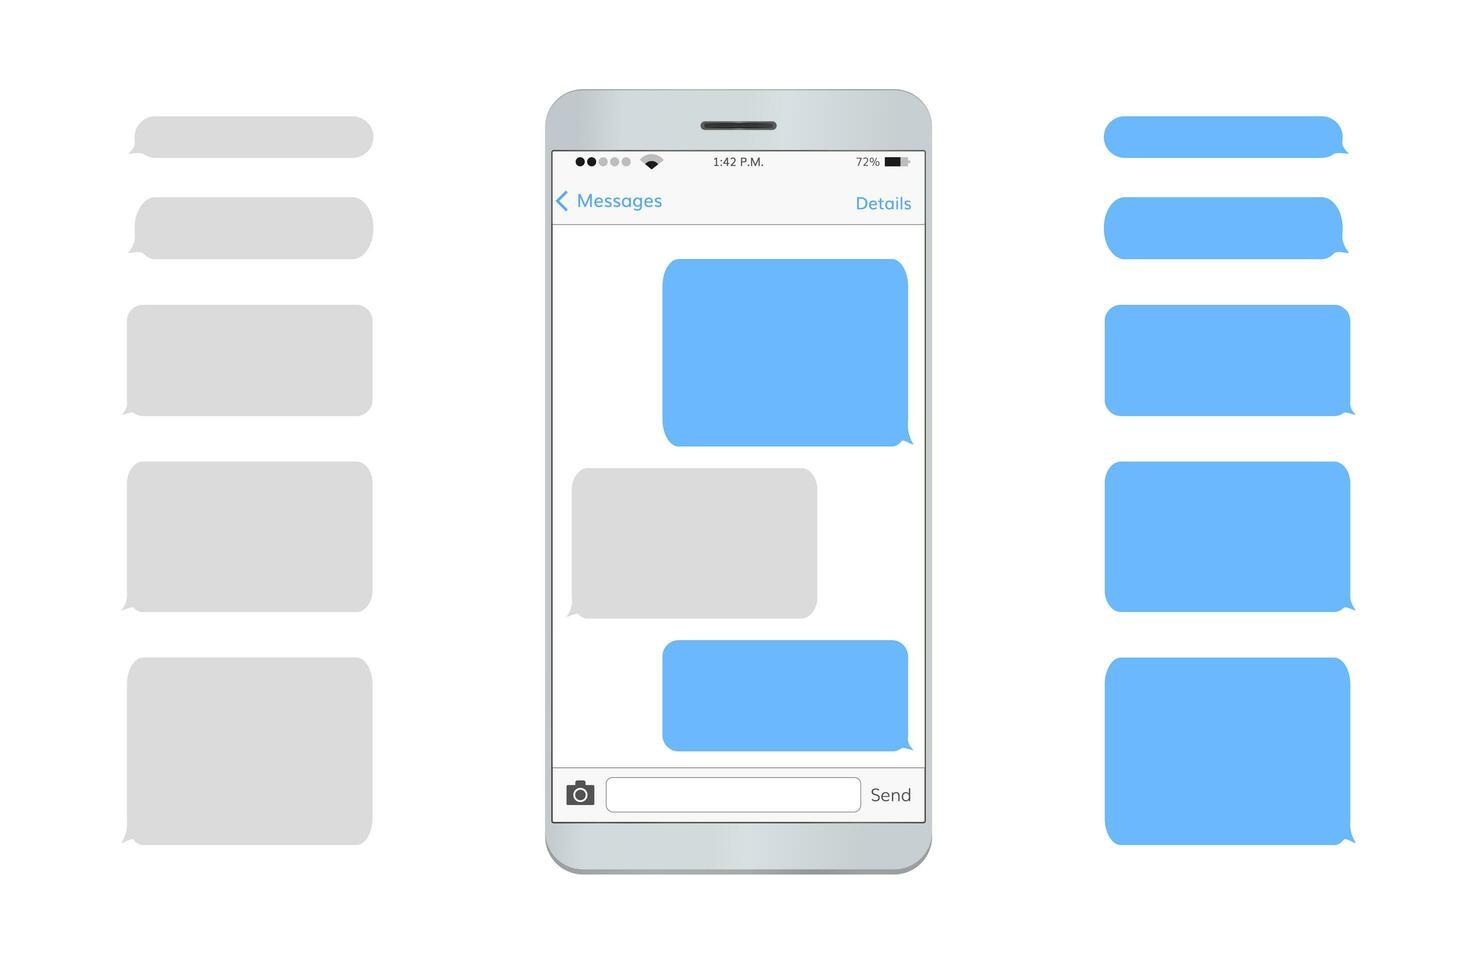 conjunto de interfaz de usuario de mensaje de texto de teléfono móvil vector